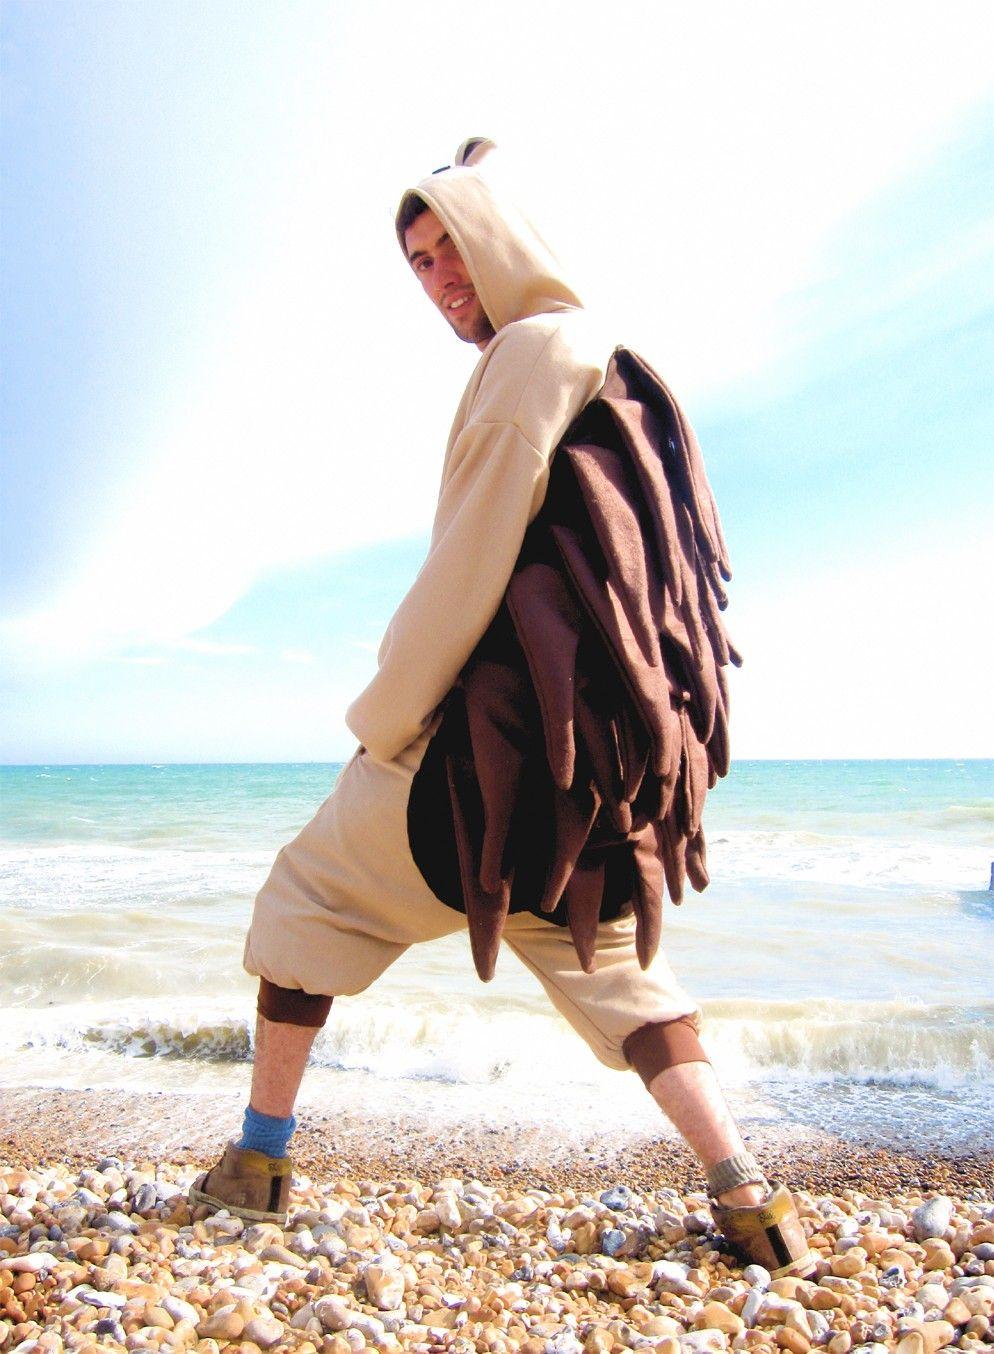 d37d0bf5de92 Hodgepodge - hedgehog onesie - All in one adult animal costume. £105.00